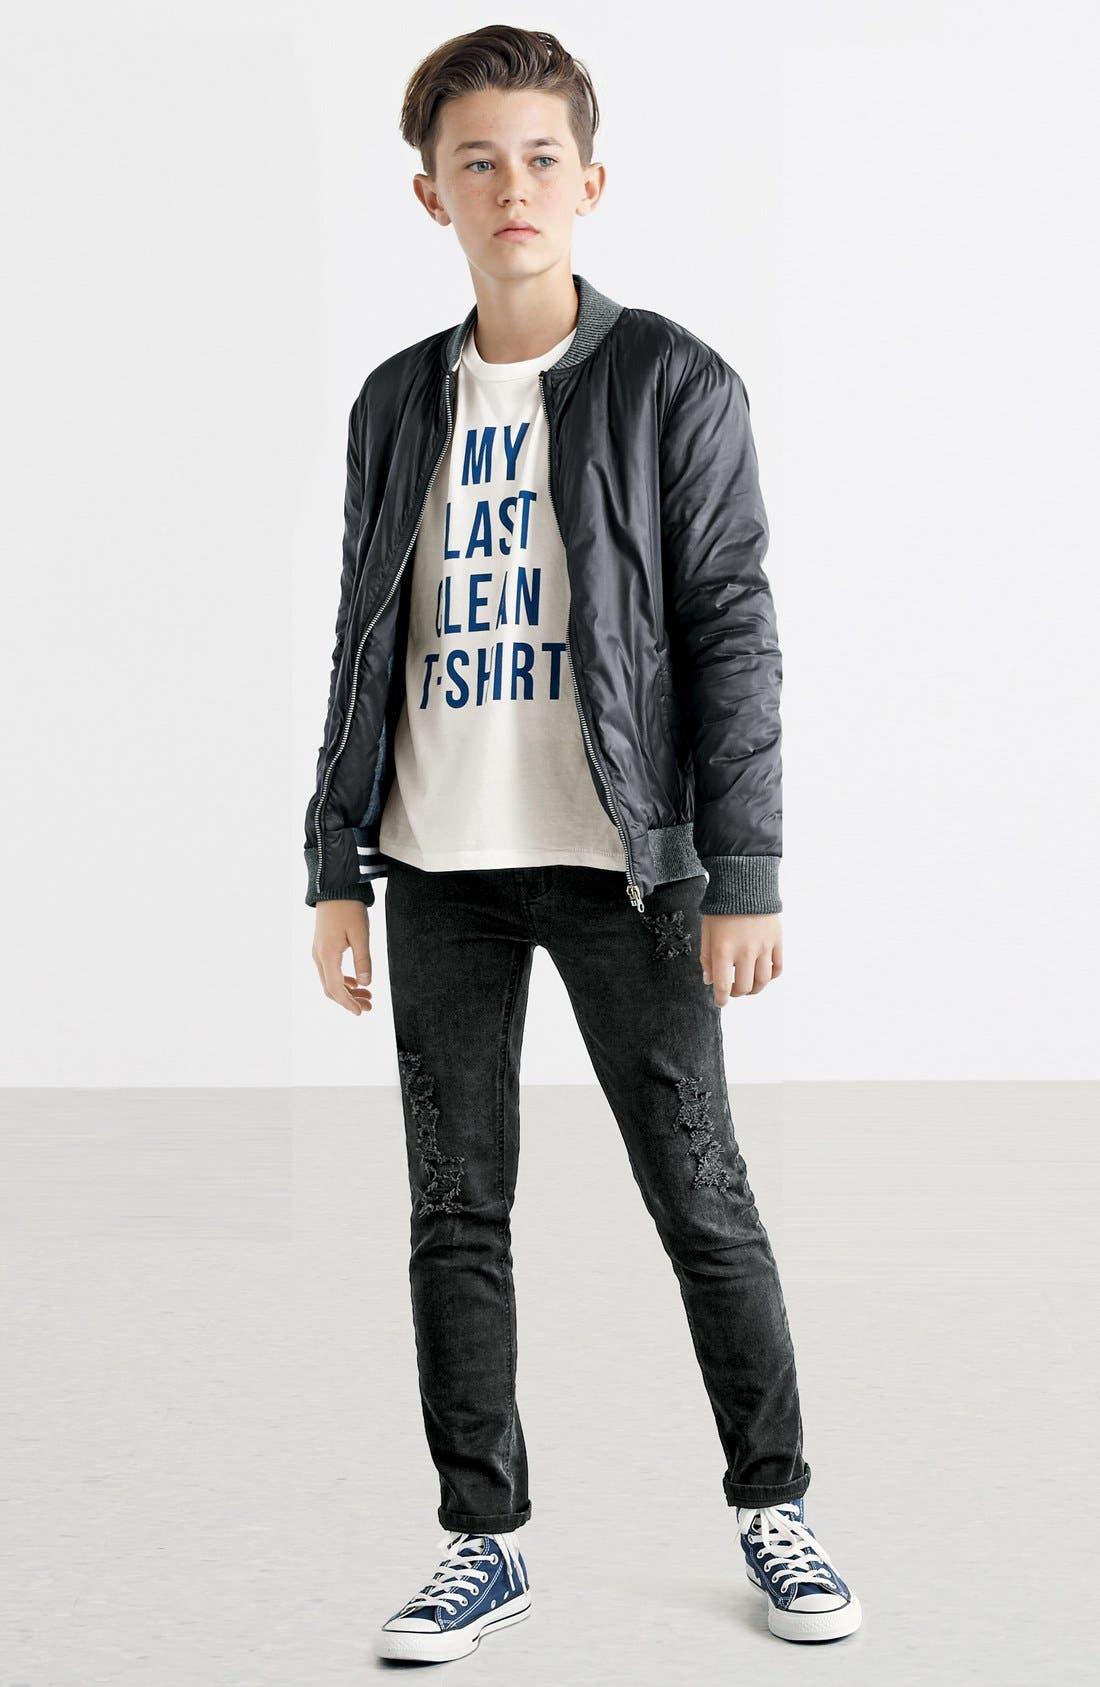 Alternate Image 2  - Junk Food 'My Last Clean T-Shirt' Graphic T-Shirt (Big Boys)